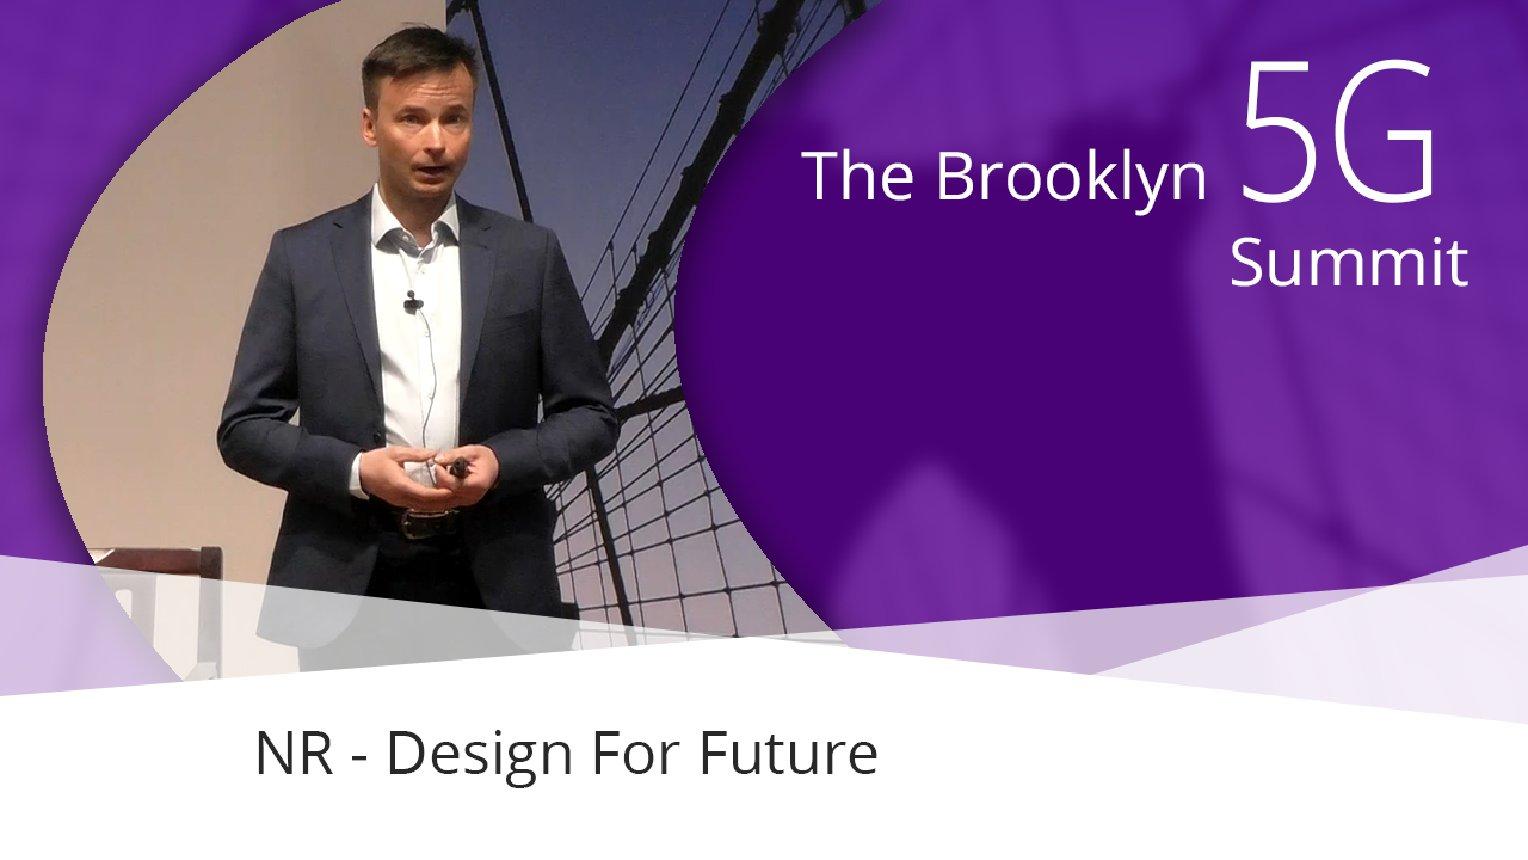 NR - Design For Future - Mikael Hook: Brooklyn 5G Summit 2017